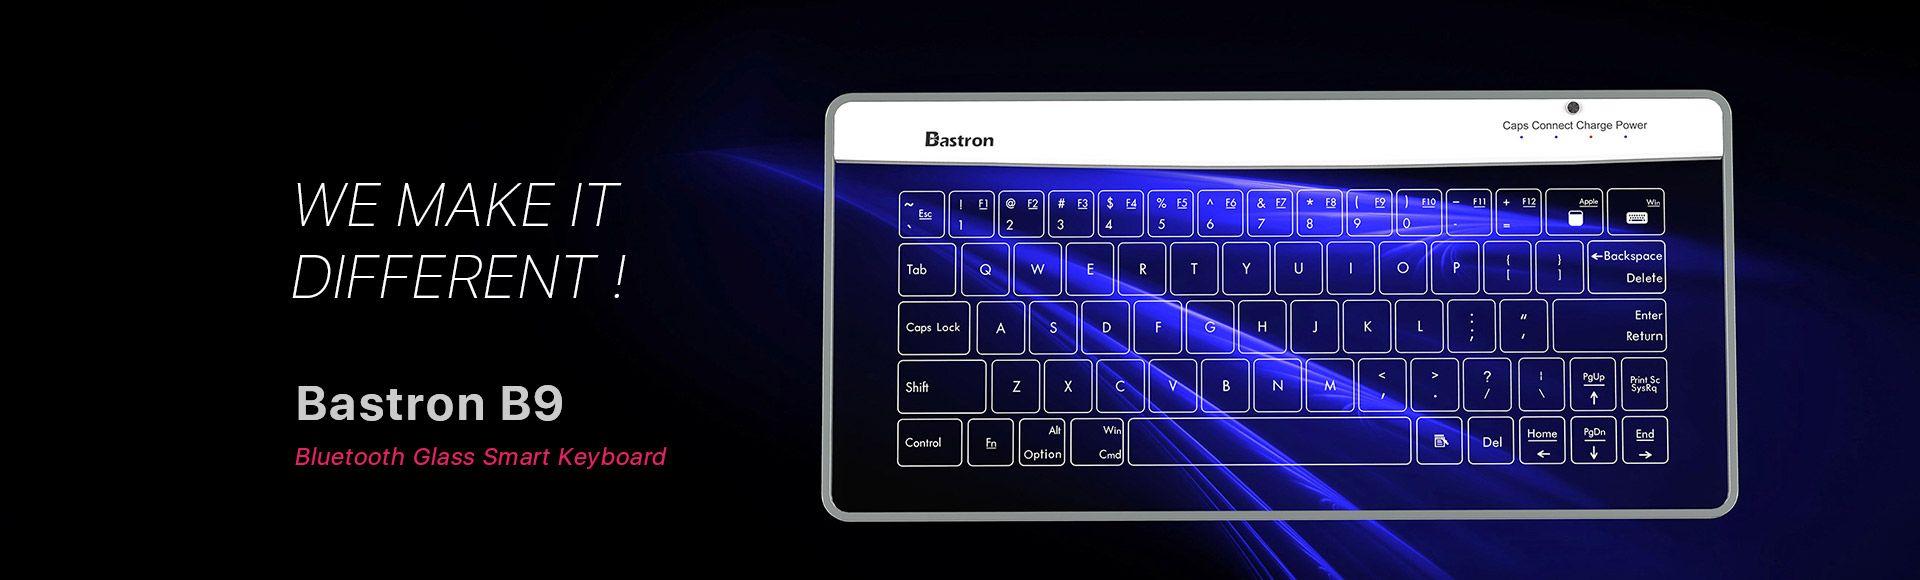 Bastron B9 Wireless Bluetooth Transparent Glass Keyboard - Ultra-thin,Splash-resistant glass,Wireless bluetooth touch keyboard with Blue LED backlit